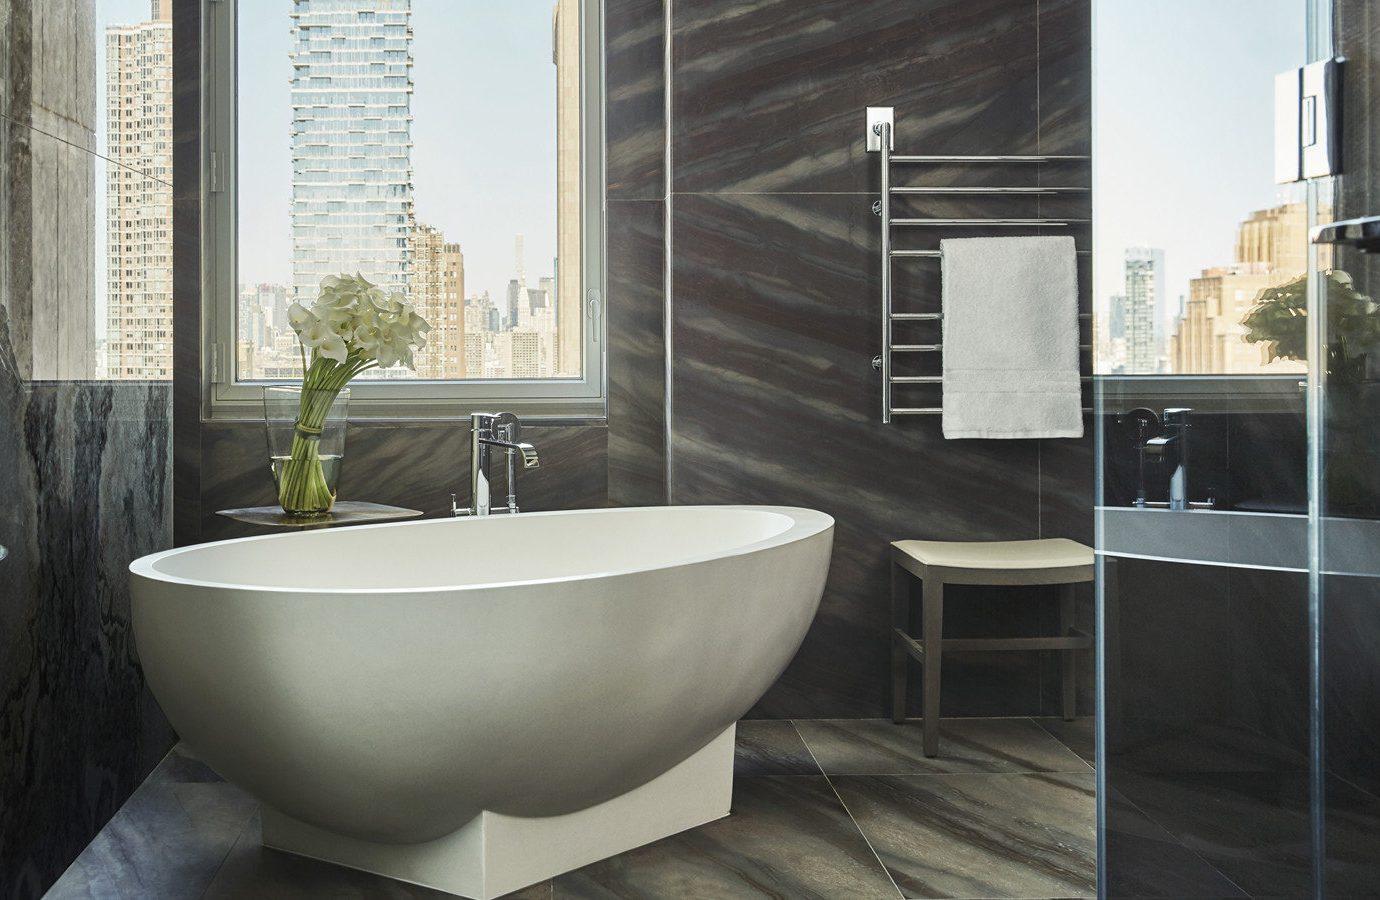 Hotels indoor floor window room bathtub bathroom plumbing fixture bidet interior design flooring tile tub tiled